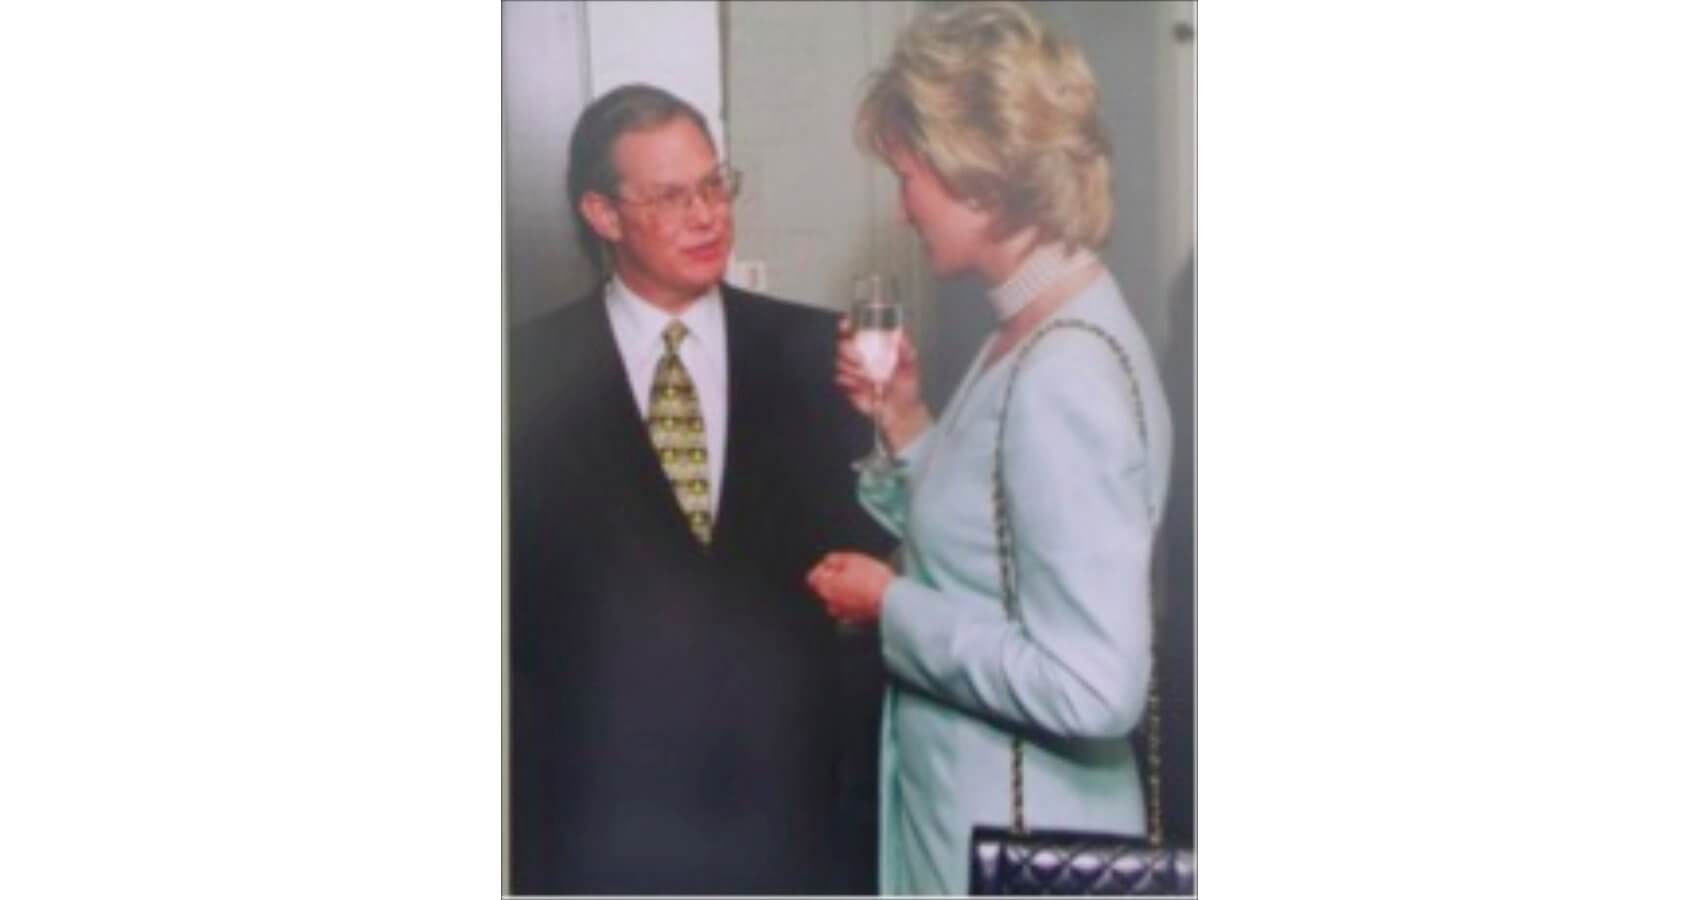 Jordan meets Princess Diana during her 1996 visit to Chicago